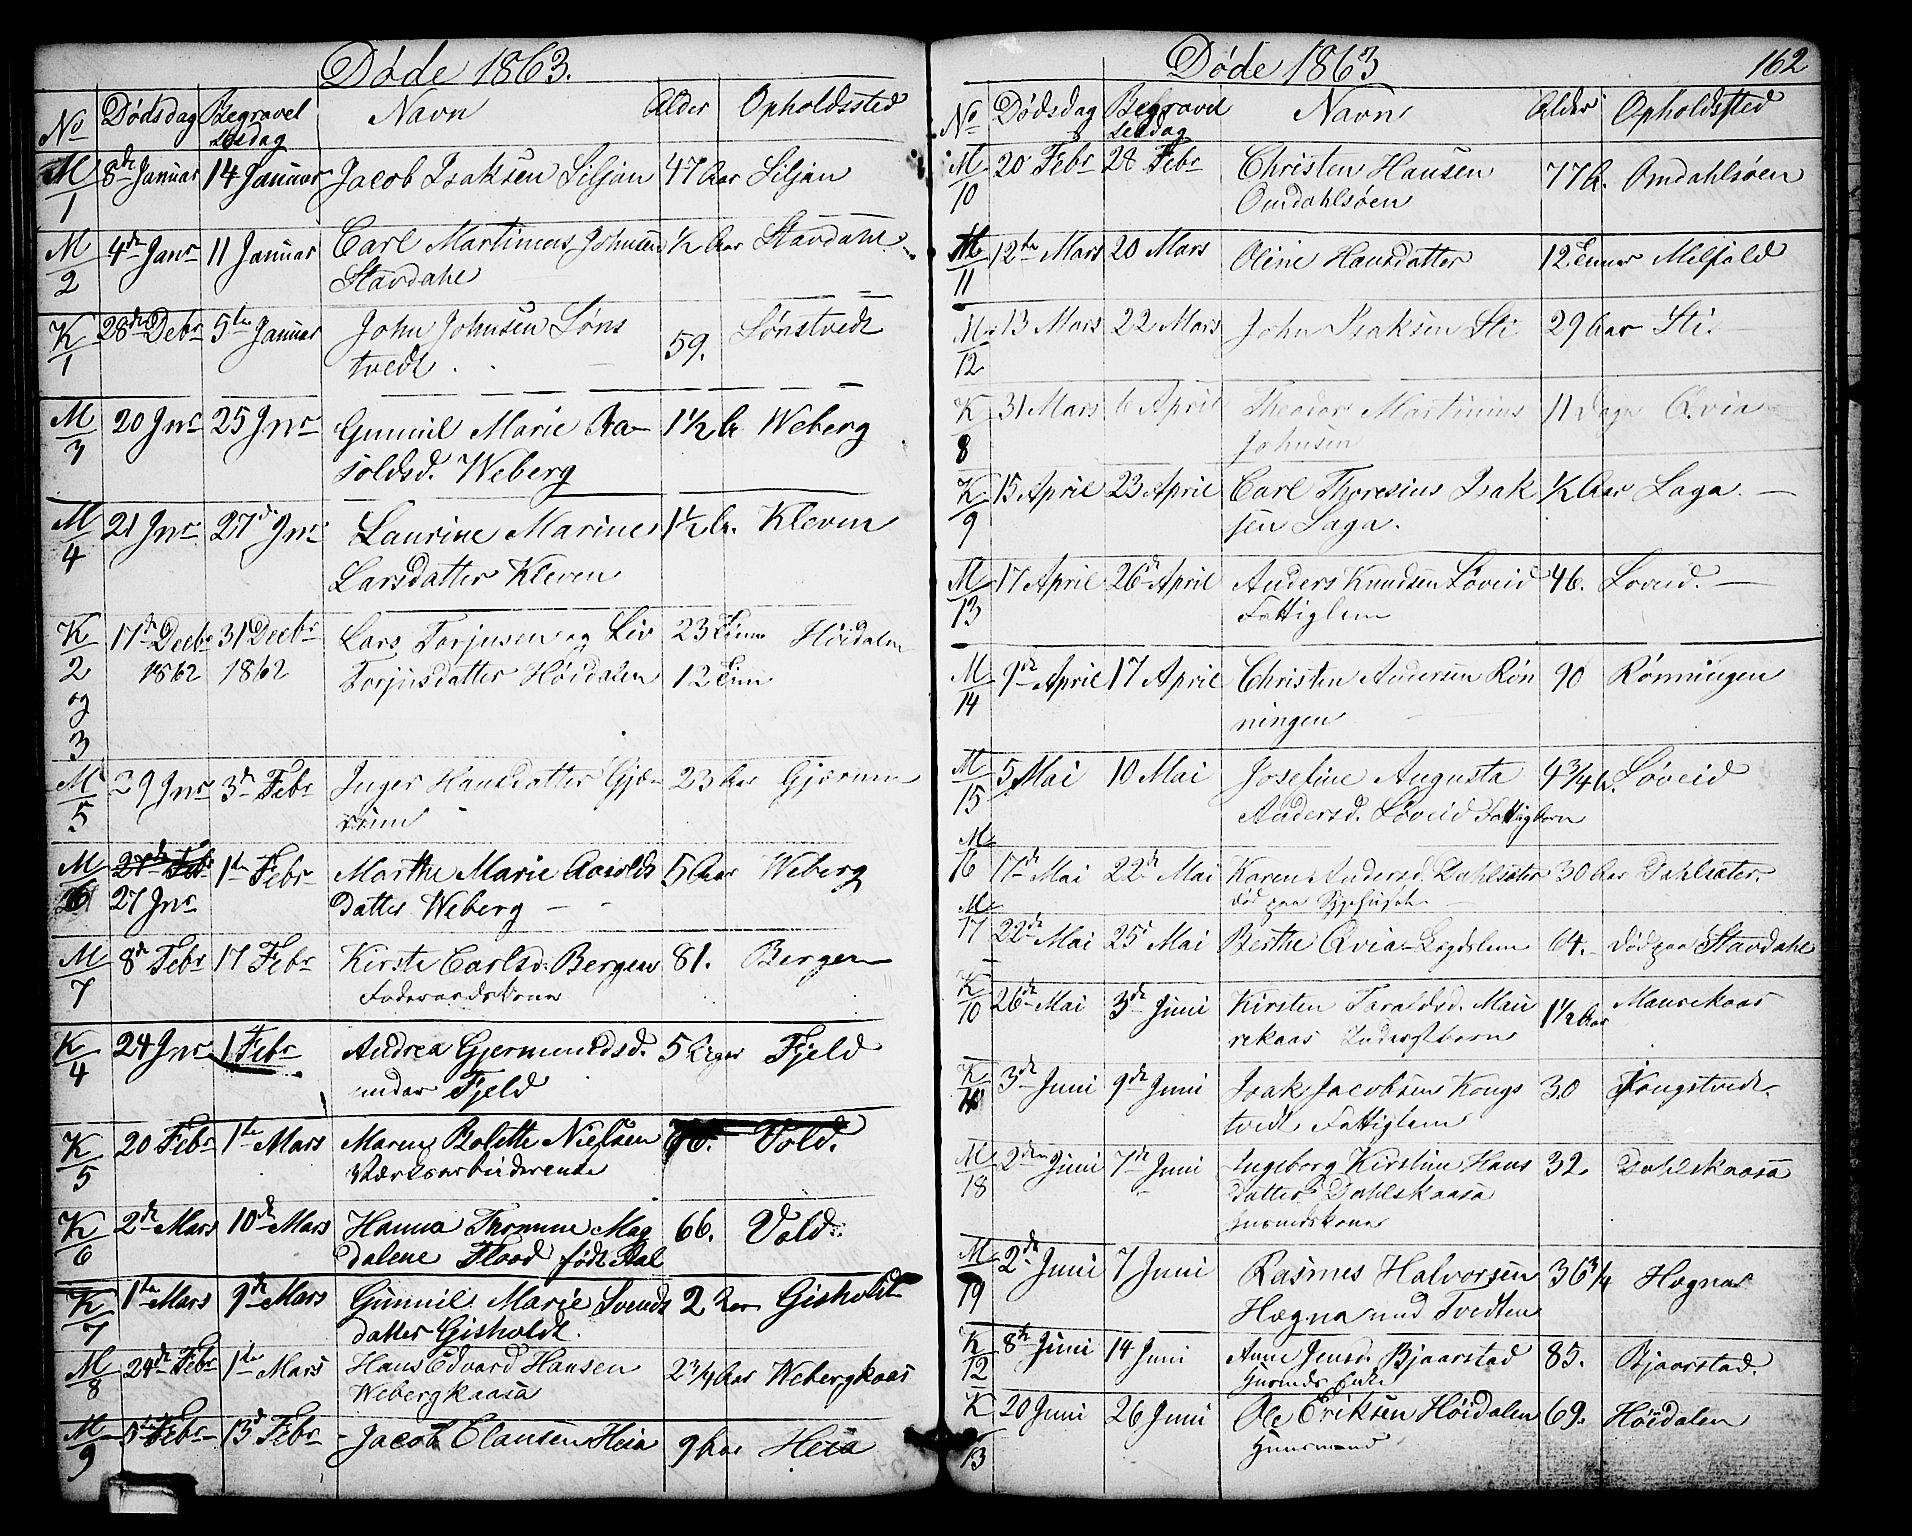 SAKO, Solum kirkebøker, G/Gb/L0002: Klokkerbok nr. II 2, 1859-1879, s. 162